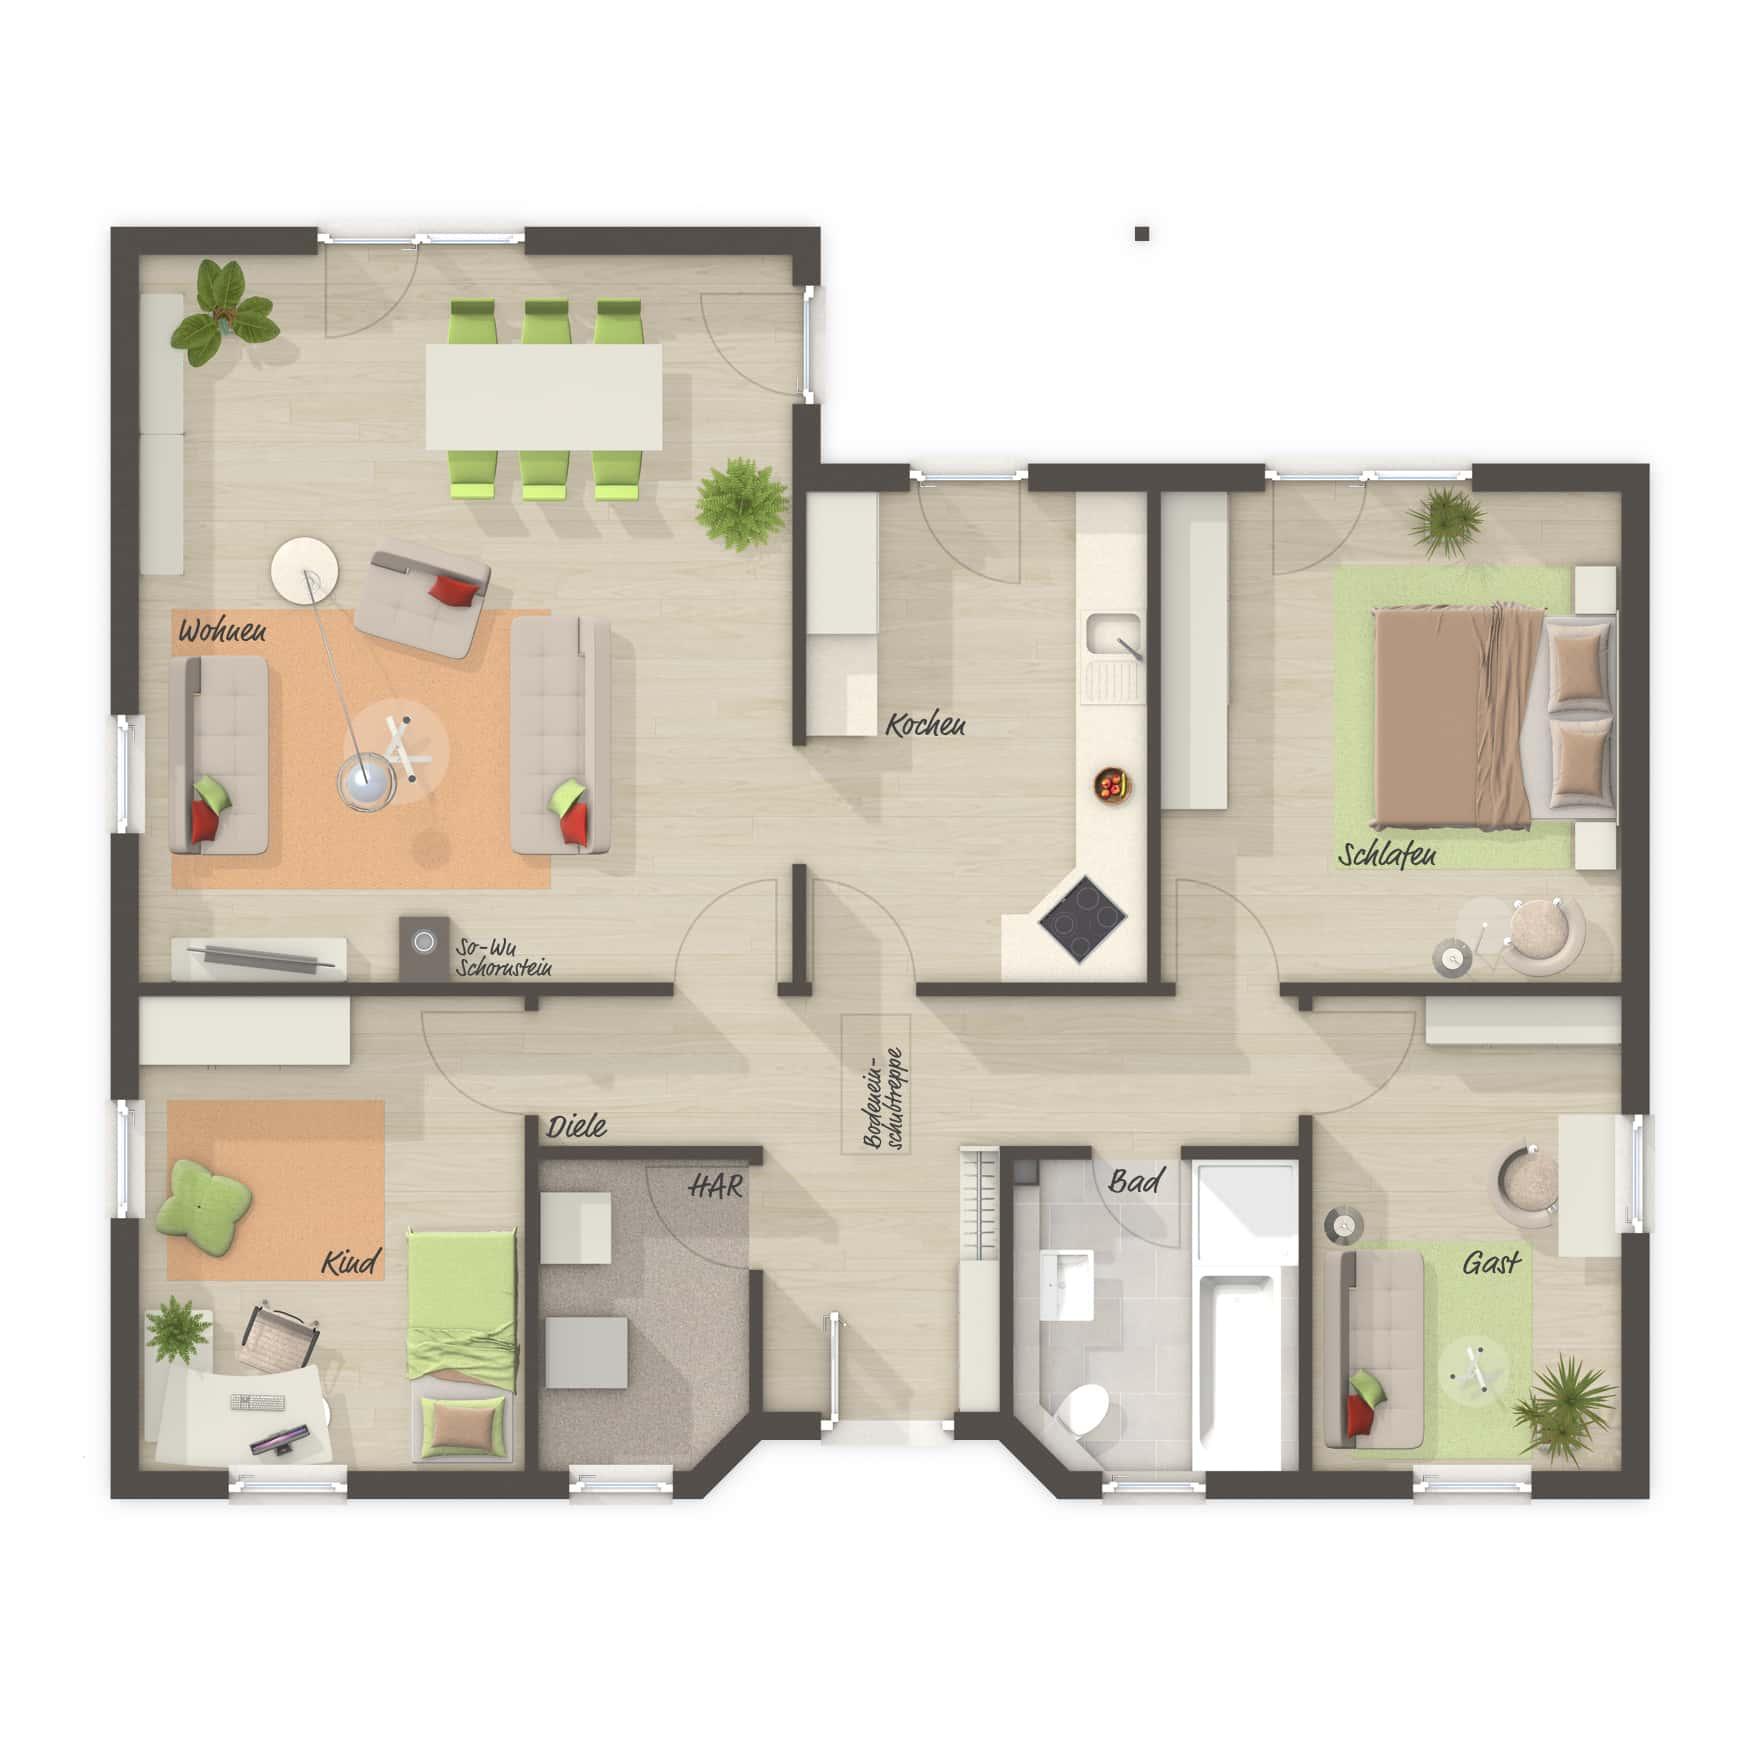 Grundriss Bungalow 4 Zimmer, 108 qm - Massivhaus Winkelbungalow 108 Town Country Haus - HausbauDirekt.de